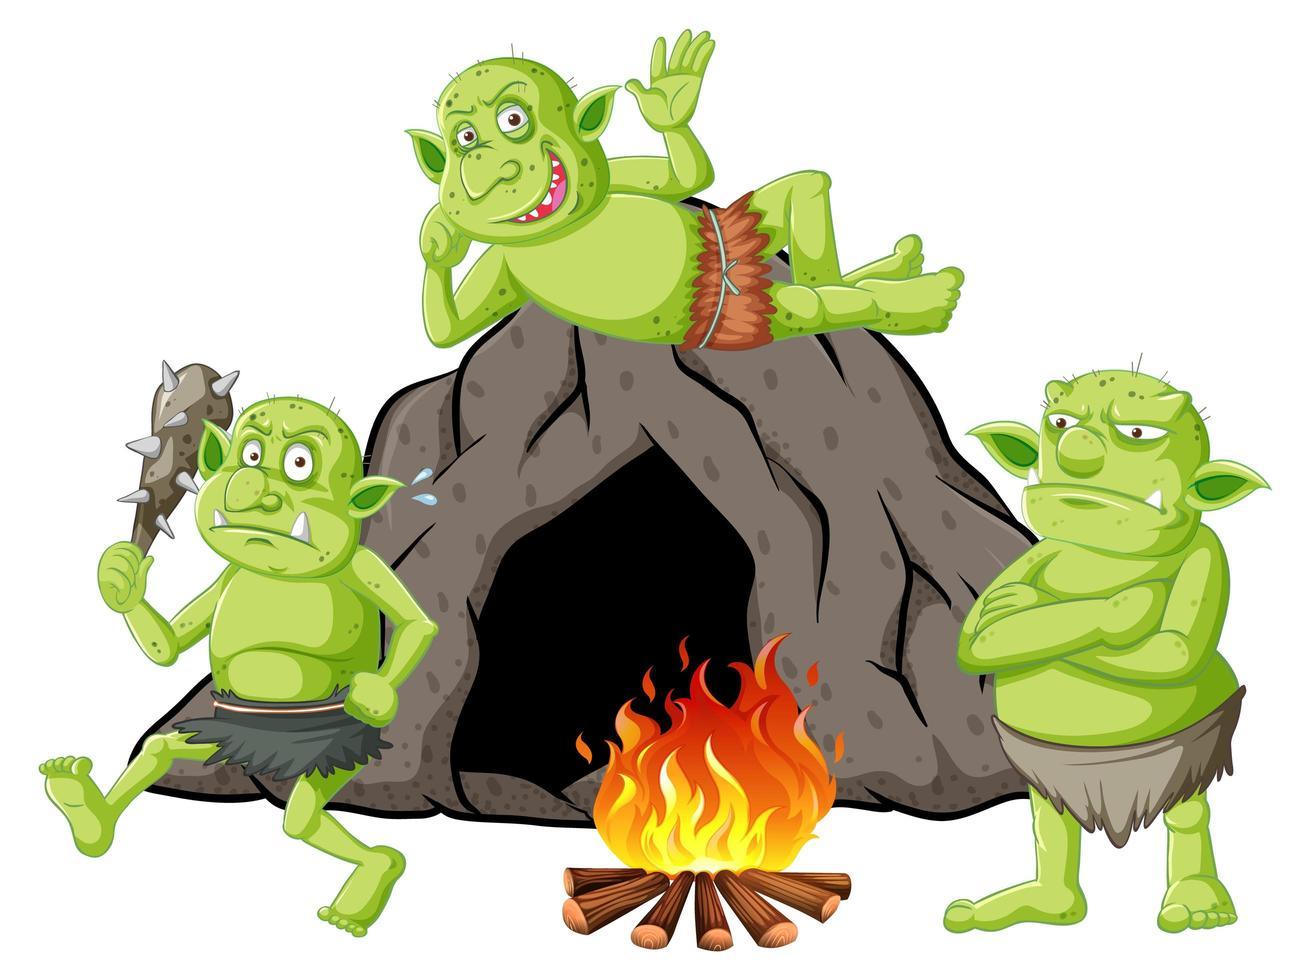 goblins of trollen met grotwoning en kampvuur vector